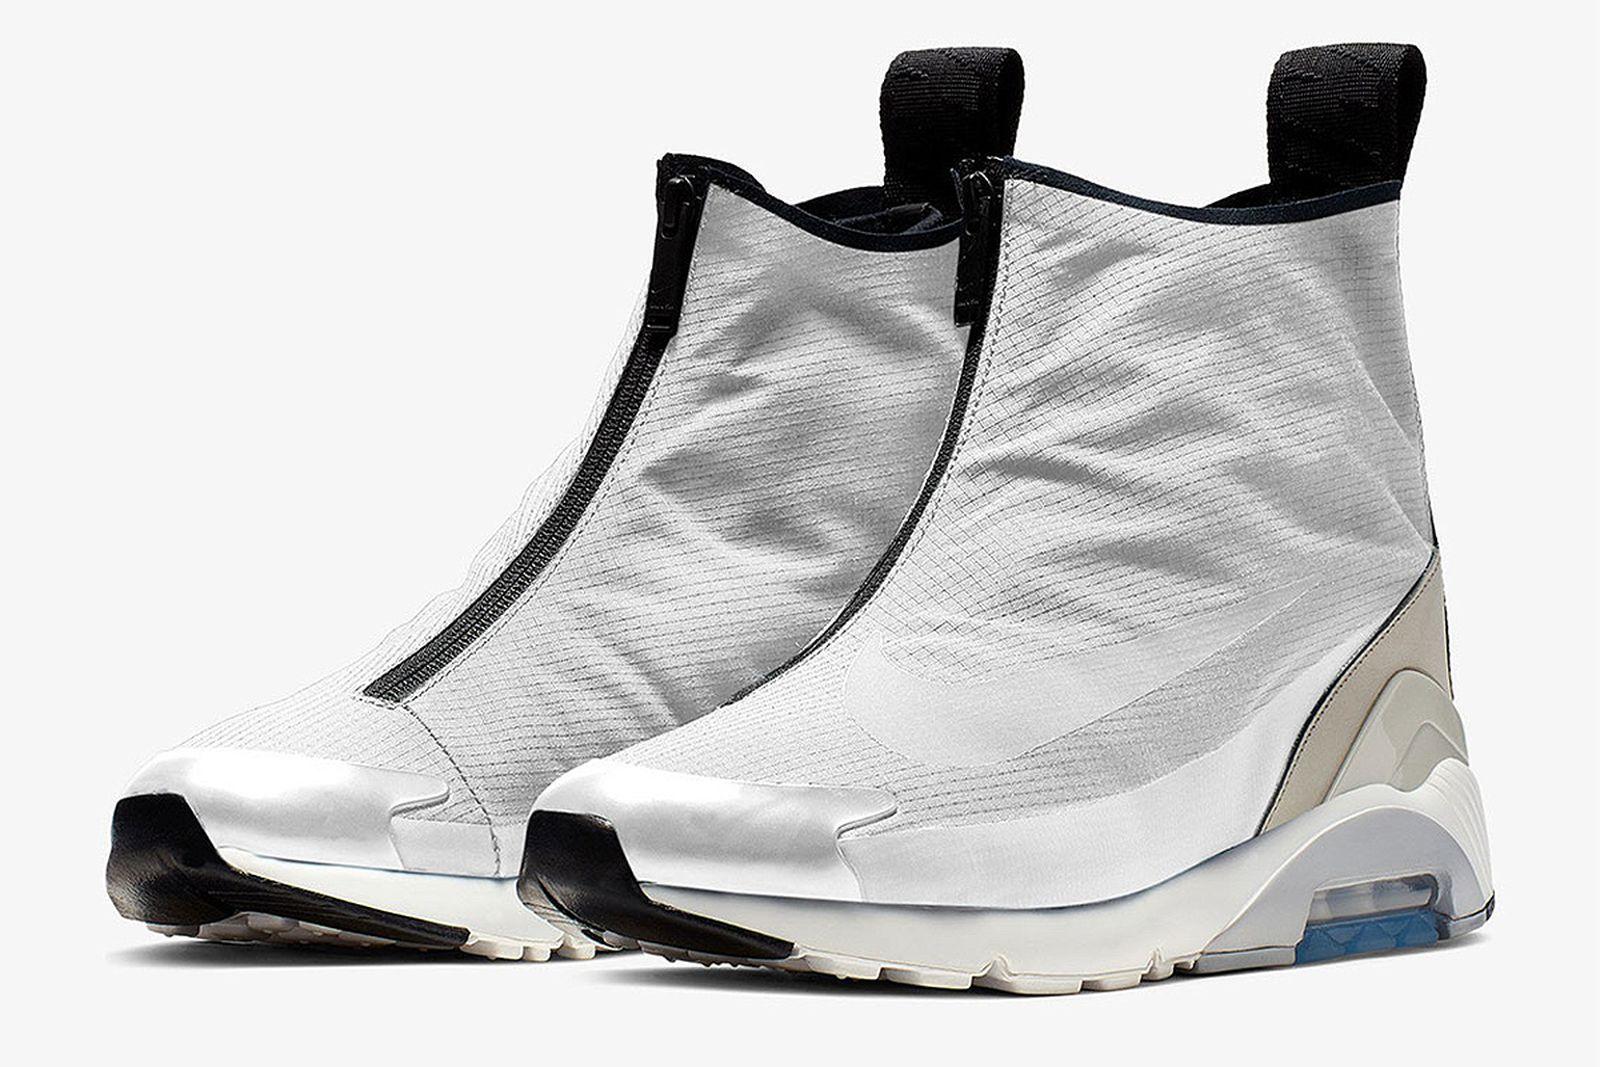 ambush nike air max 180 release date price white Ambush x Nike Yoon Ahn